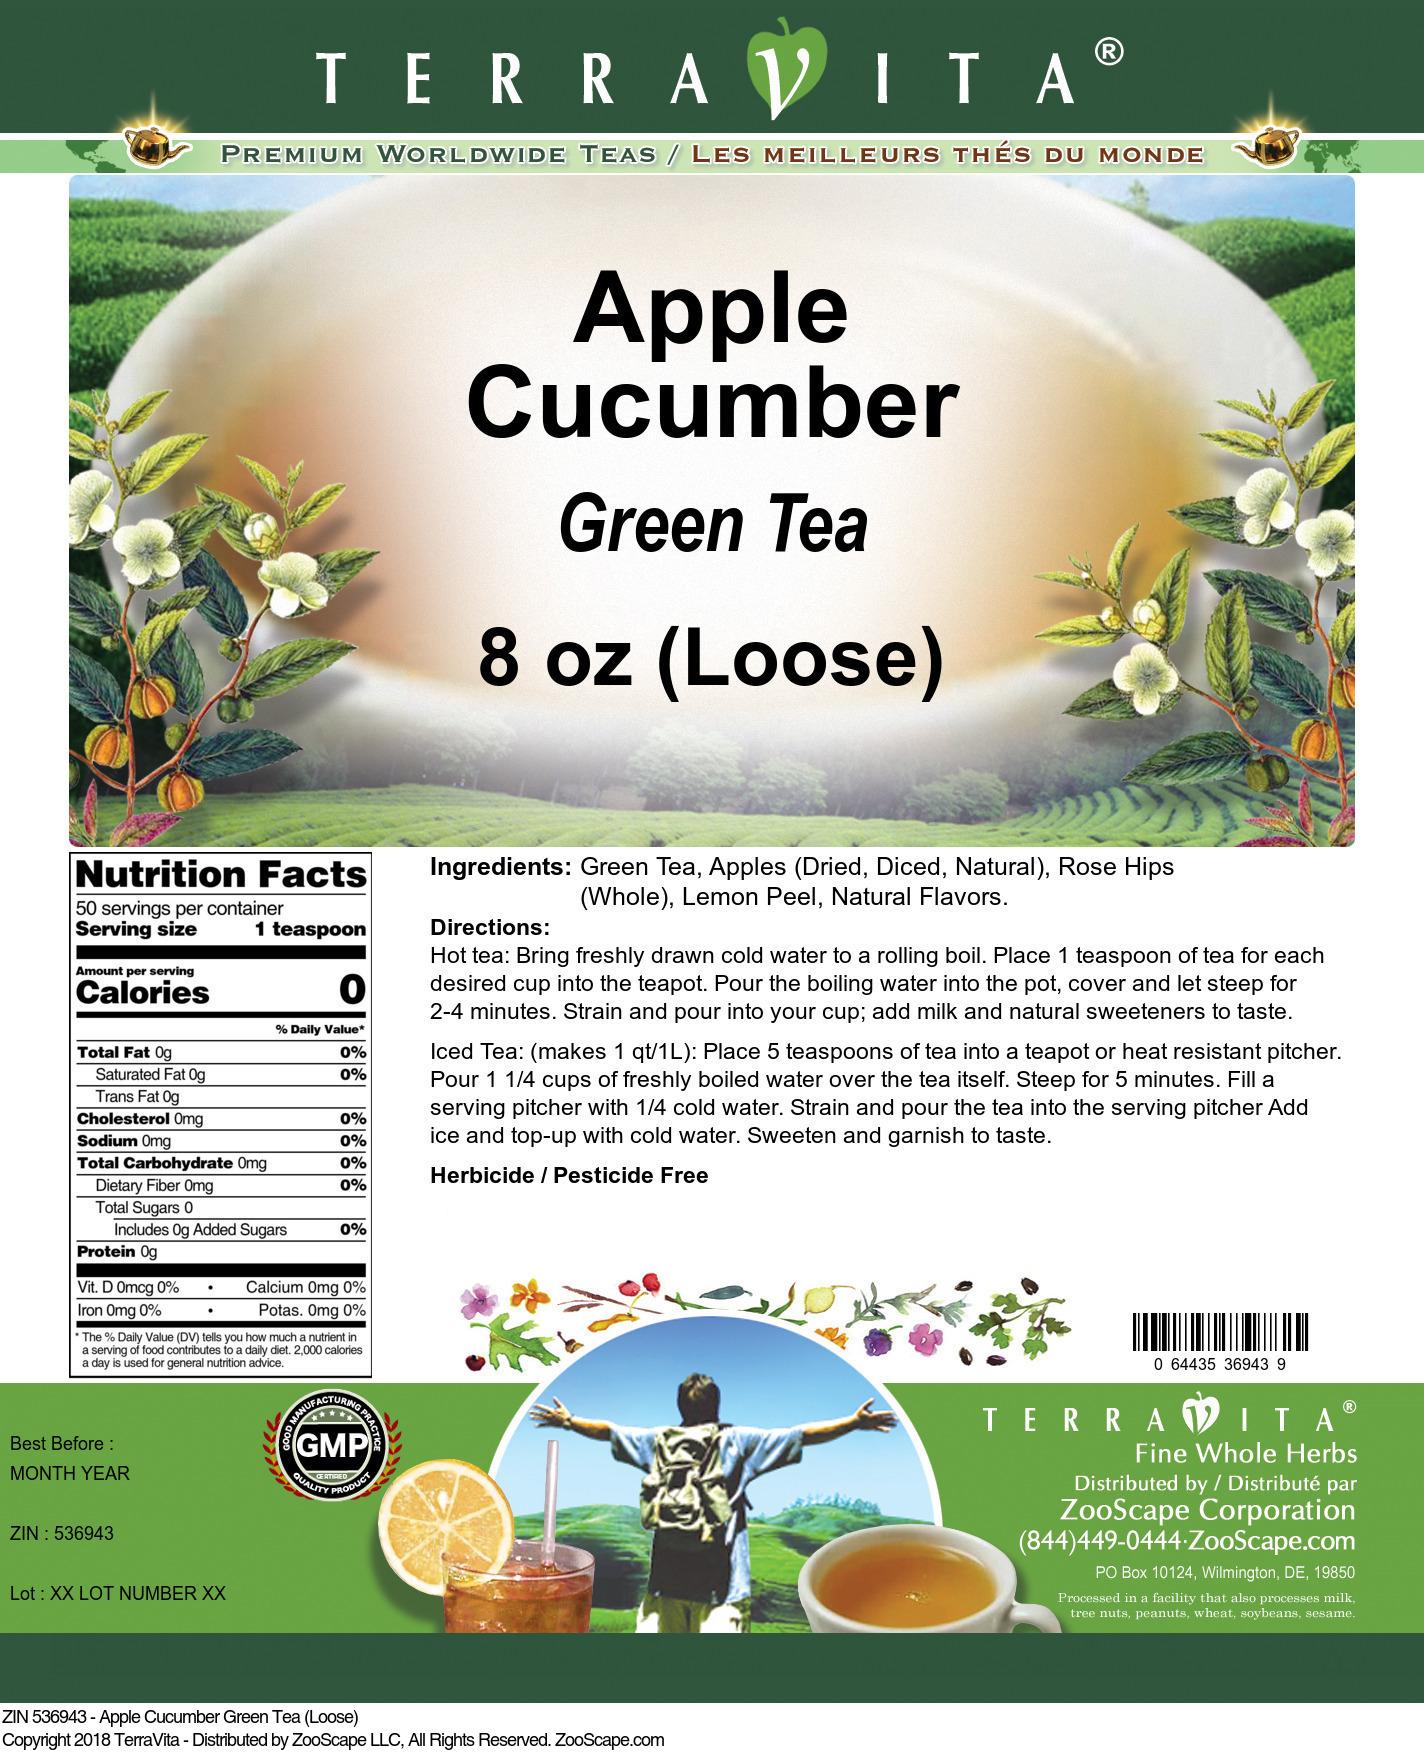 Apple Cucumber Green Tea